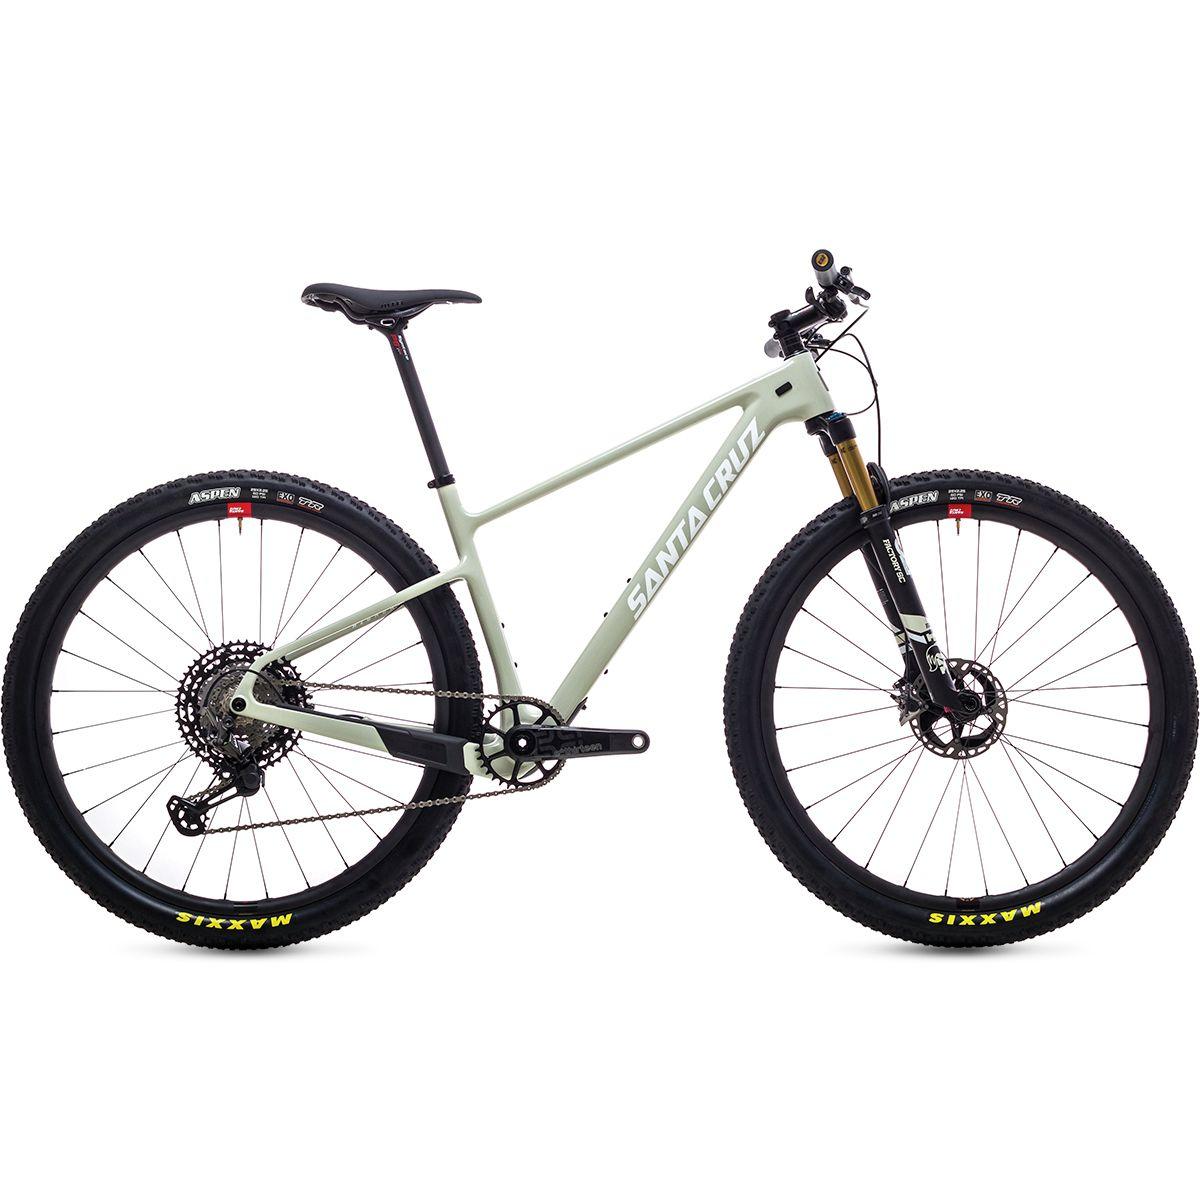 Santa Cruz Bicycles Highball Carbon CC XTR Reserve Complete